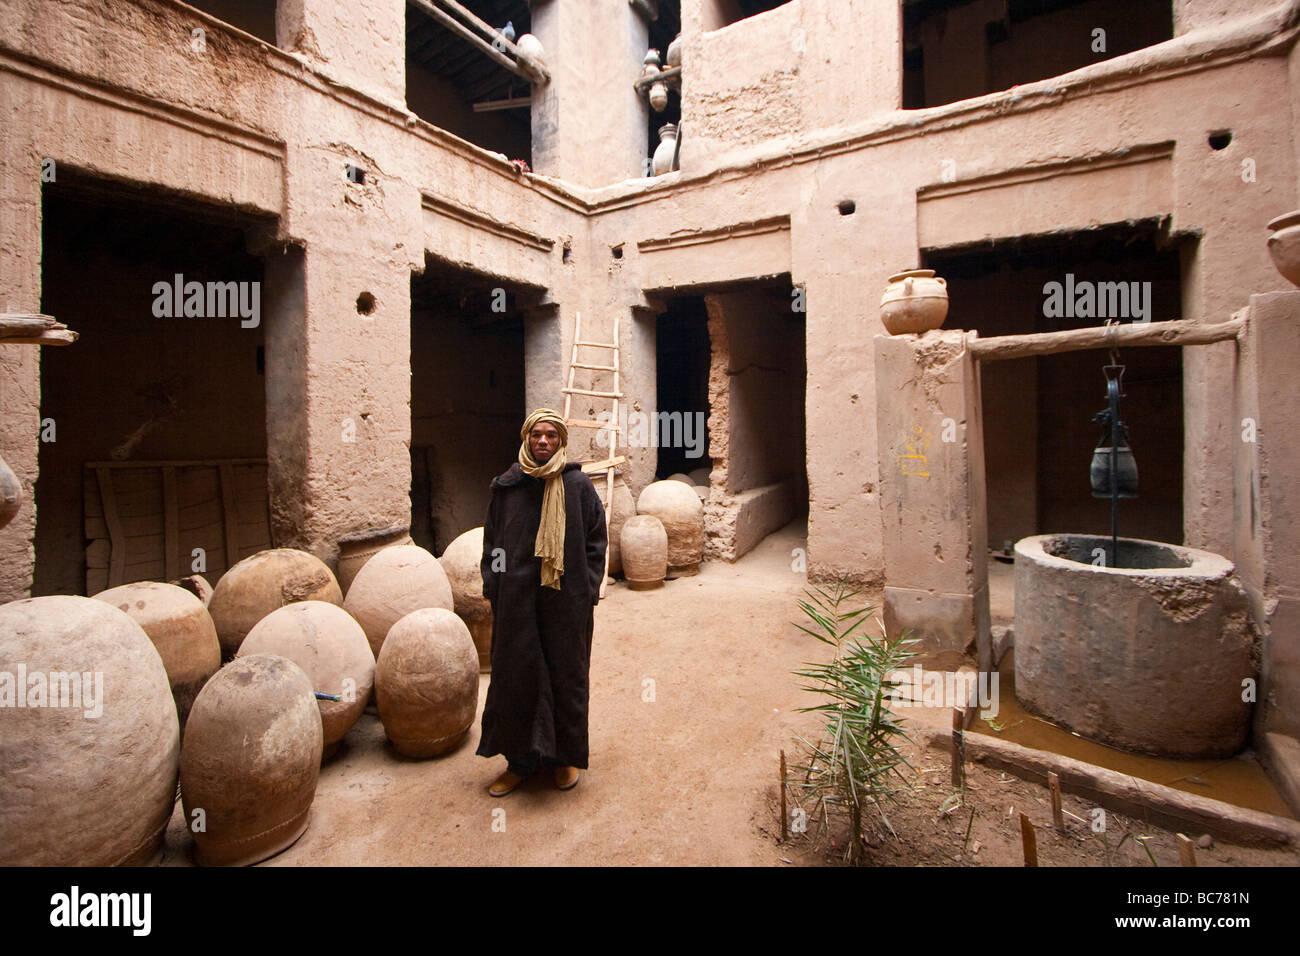 Moroccan man inside a kasbah in amezrou morocco stock for Morocco motors erie pa